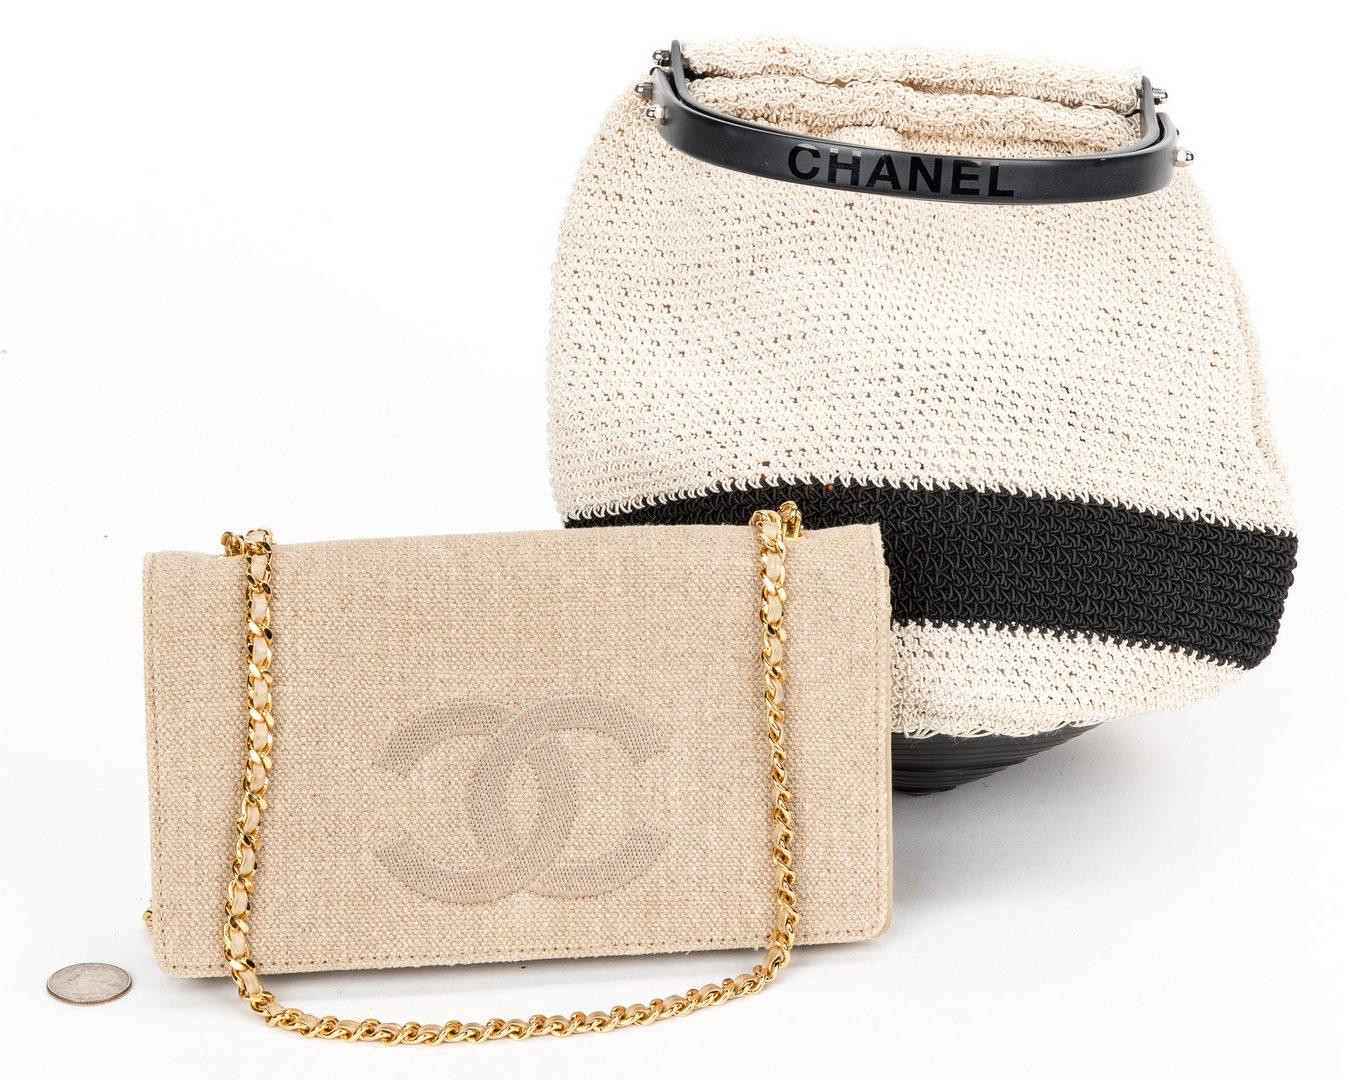 Lot 750: 2 Chanel Items incl. Wallet/Crossbody & Crochet Bag